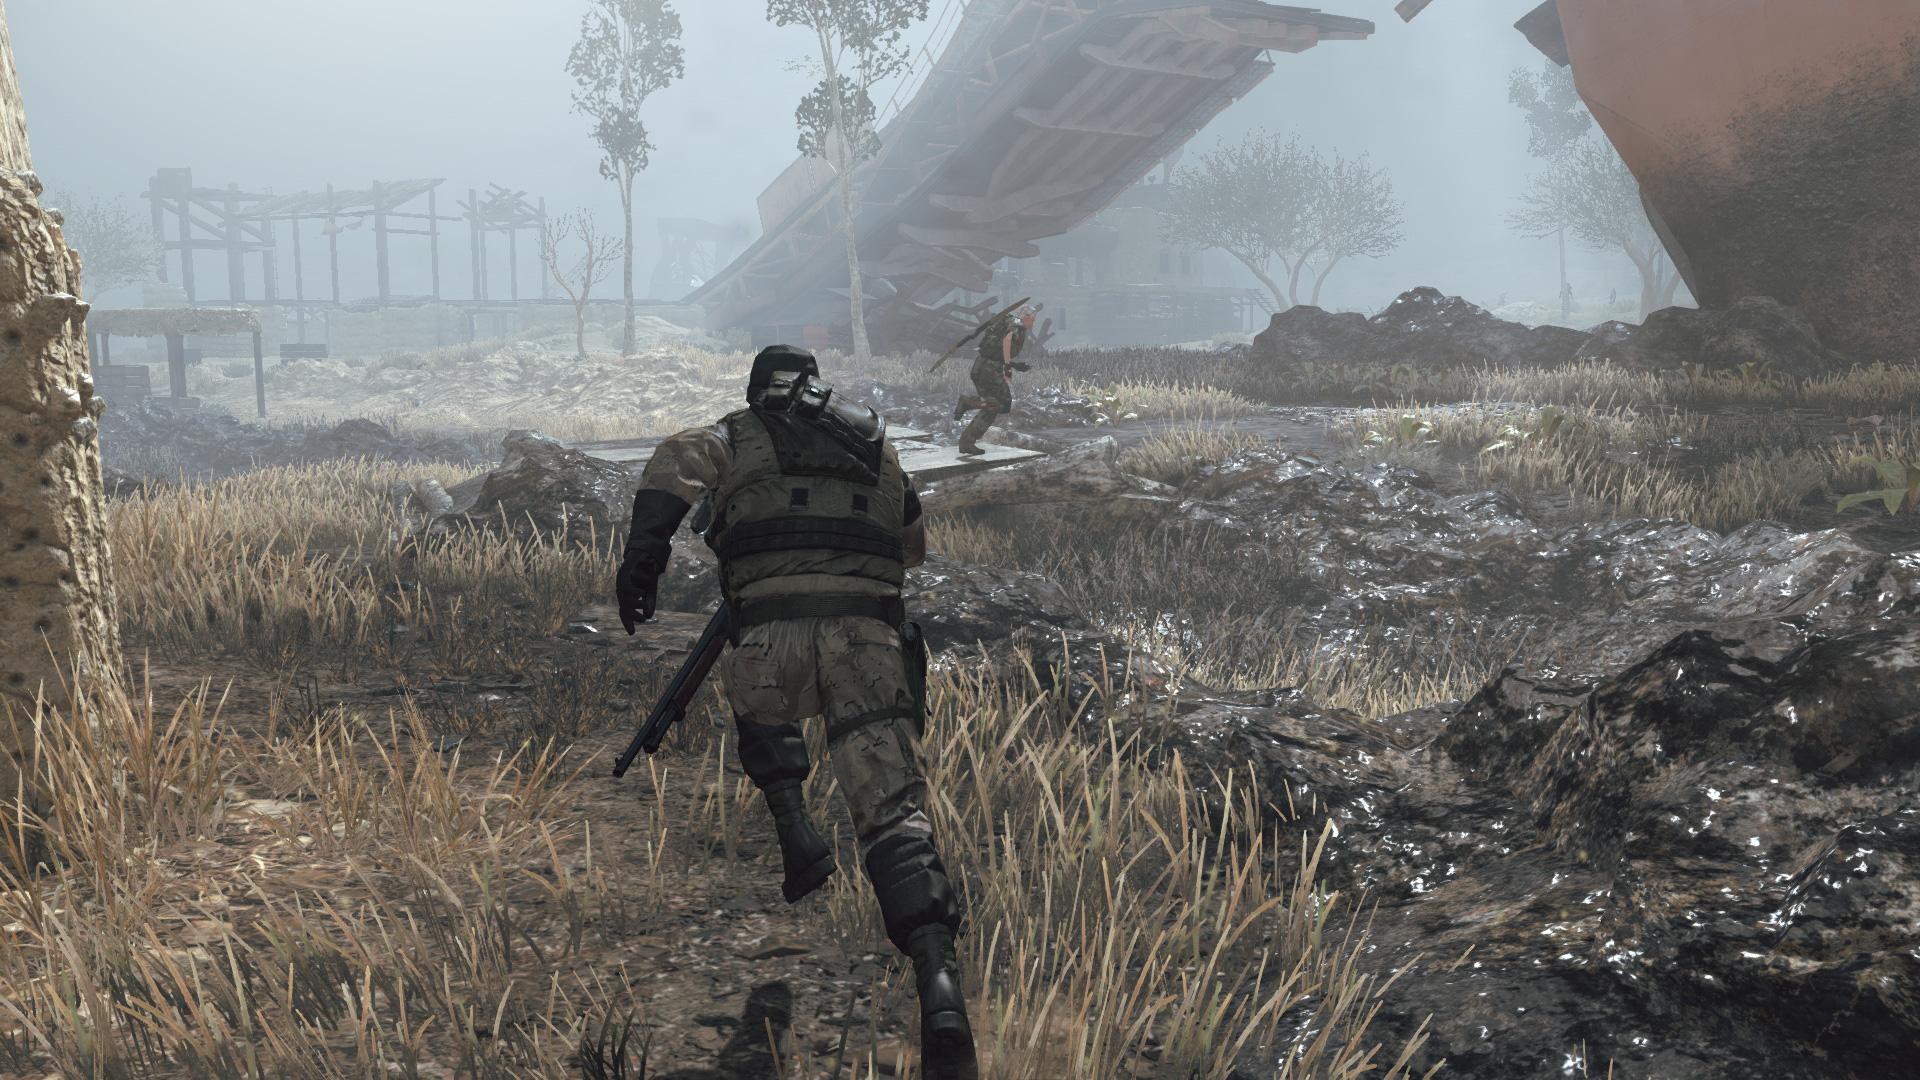 First Metal Gear Survive gameplay shown at Tokyo Game Show  Metal Gear Informer